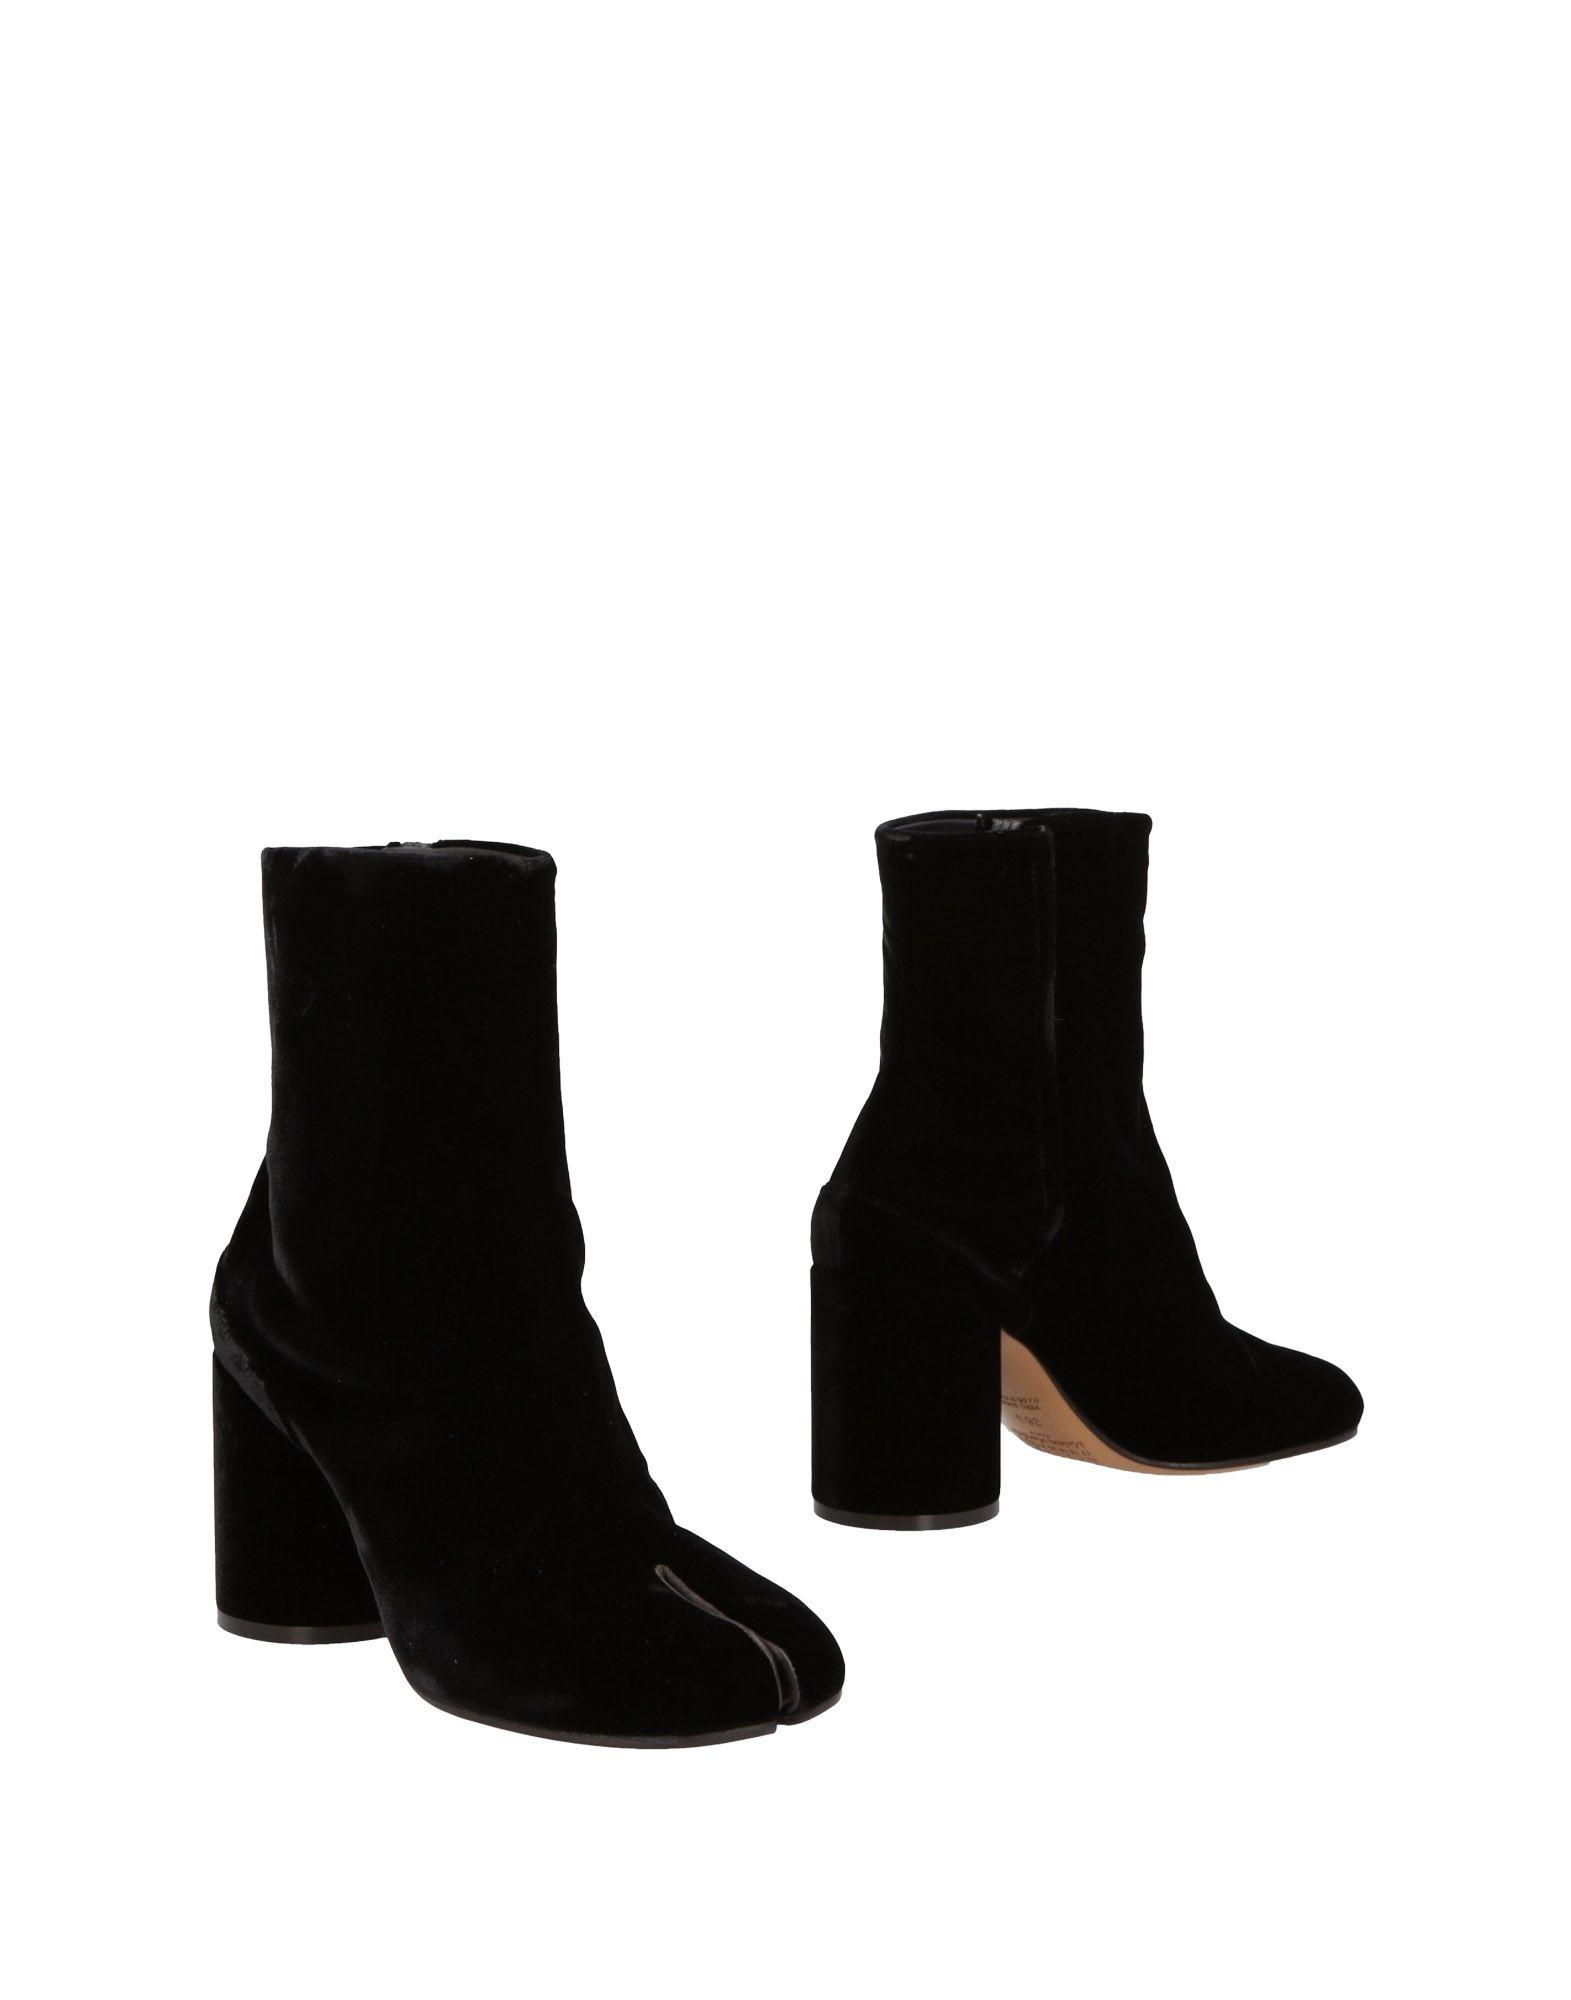 Maison Margiela Stiefelette Damen  Schuhe 11471943KM Neue Schuhe  a4d6e1